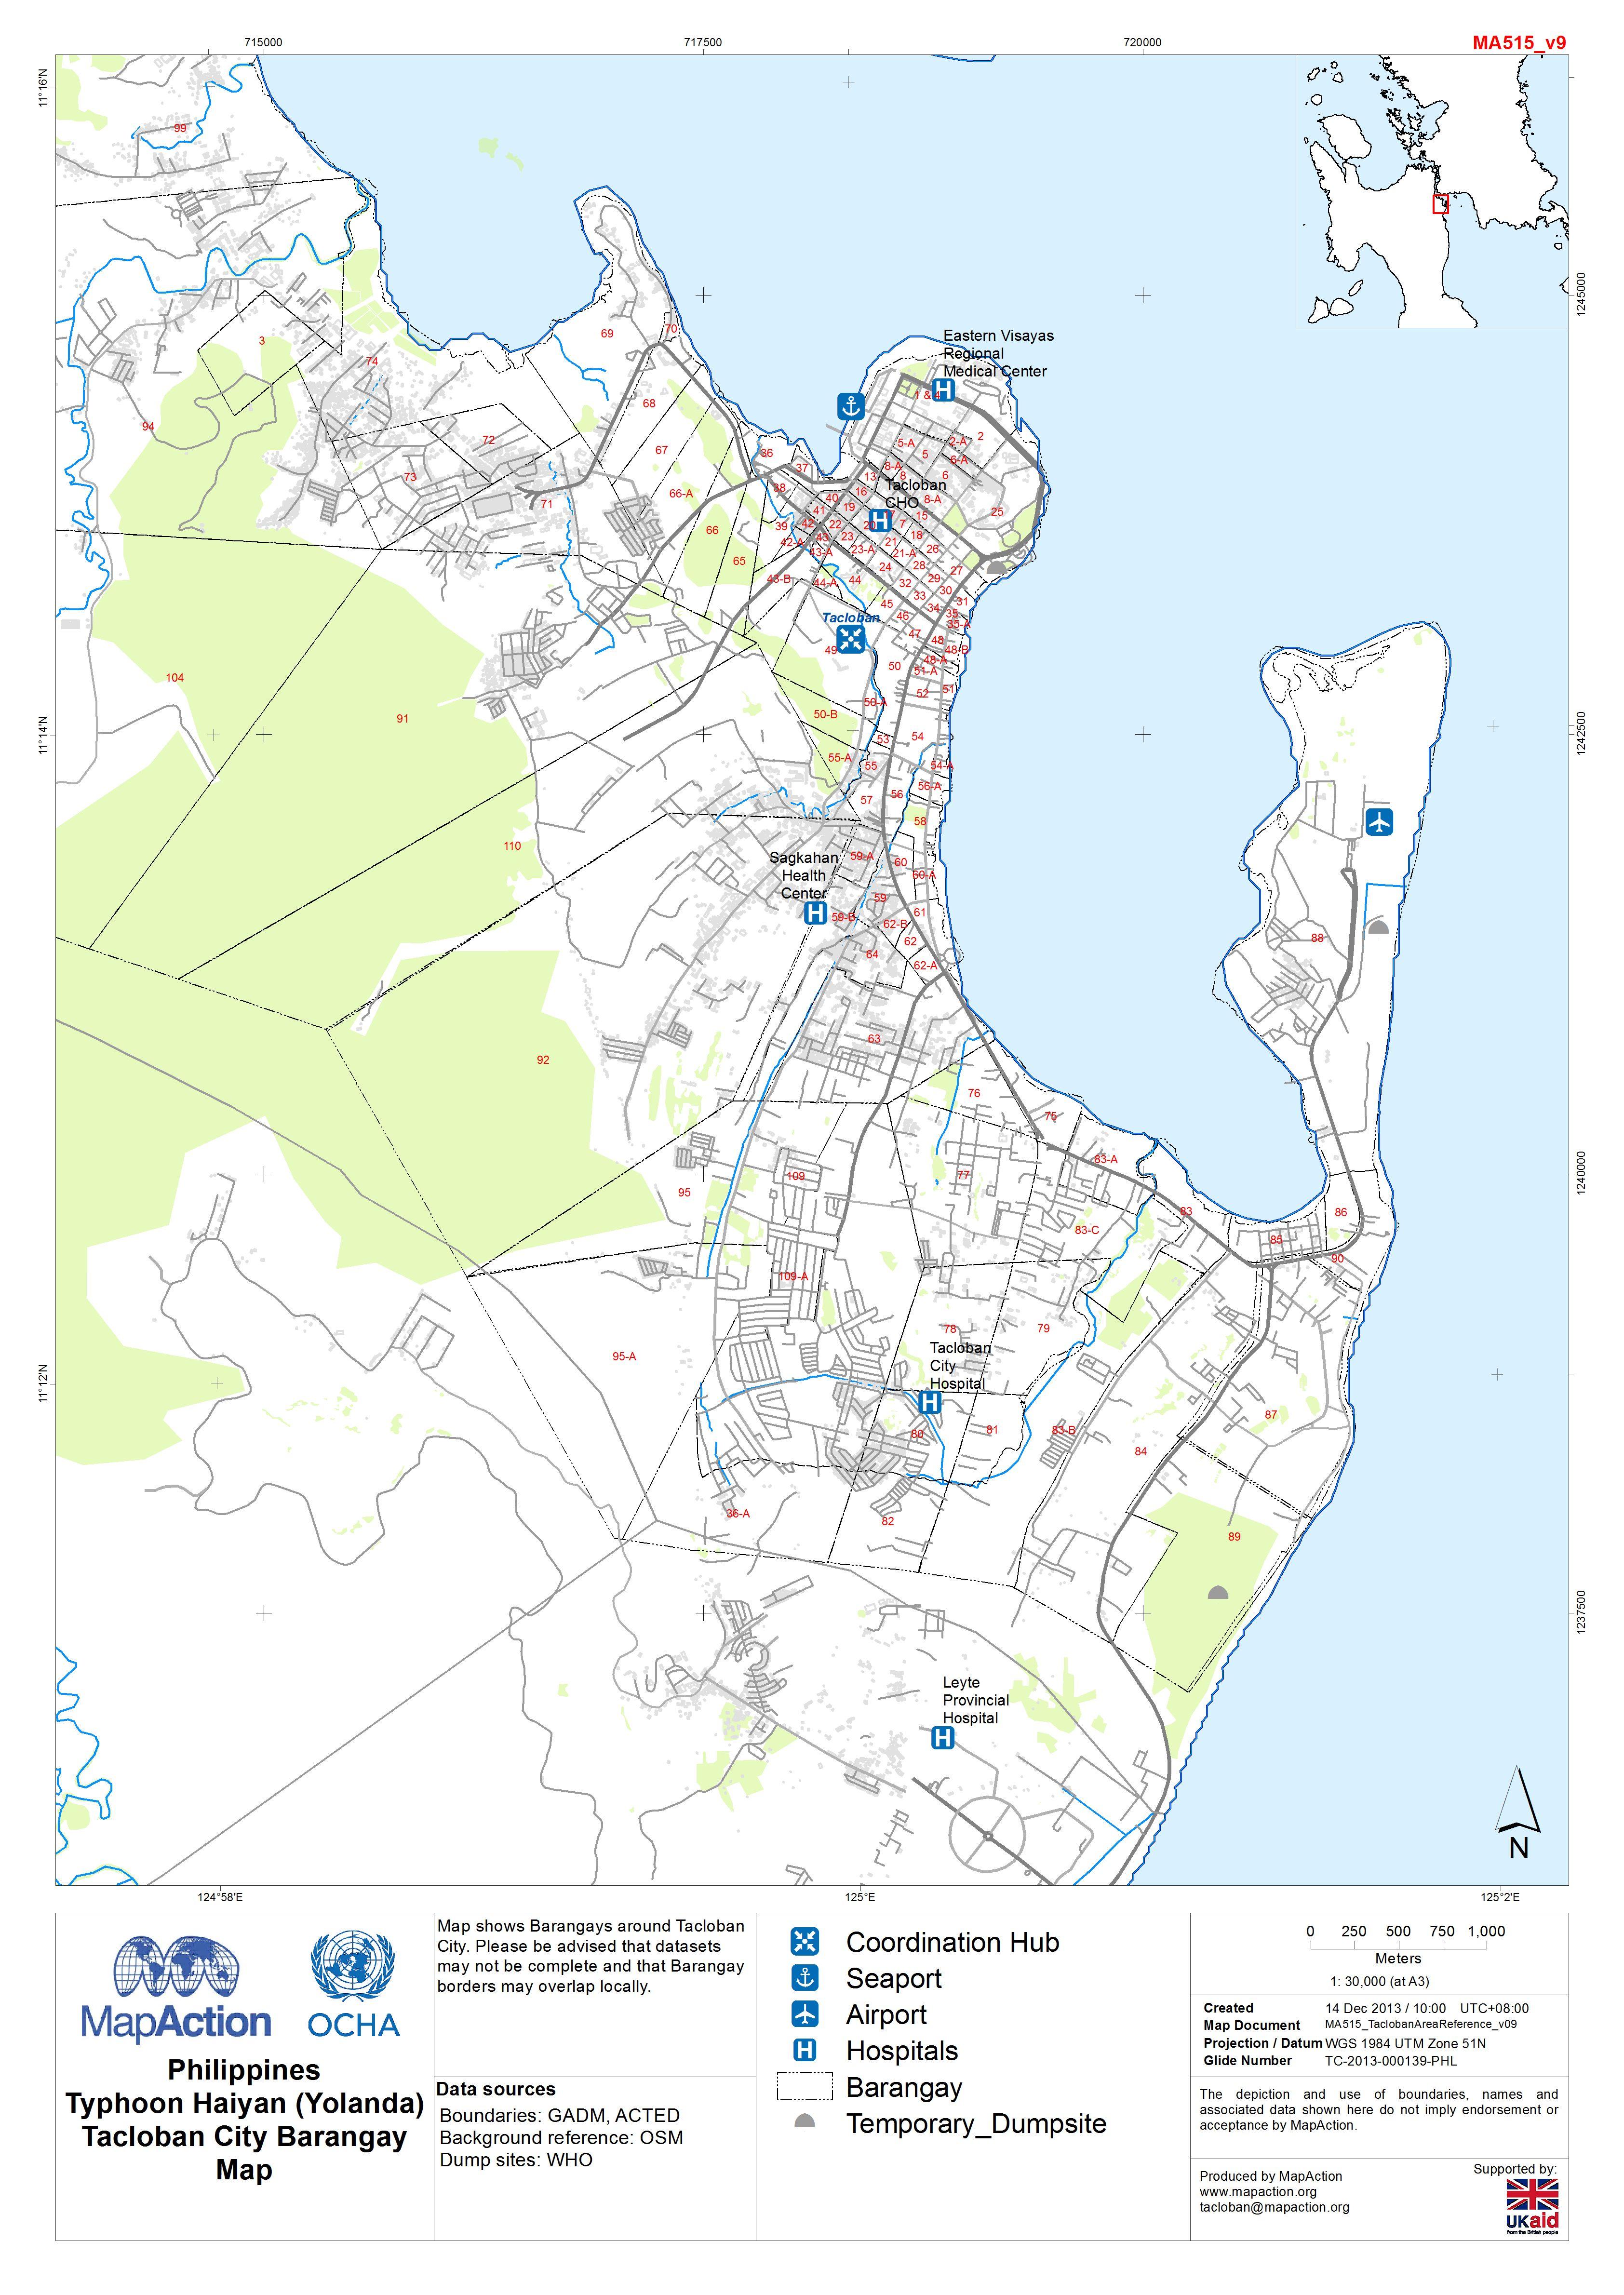 Tacloban Philippines Map.Philippines Typhoon Haiyan Yolanda Tacloban City Barangay Map